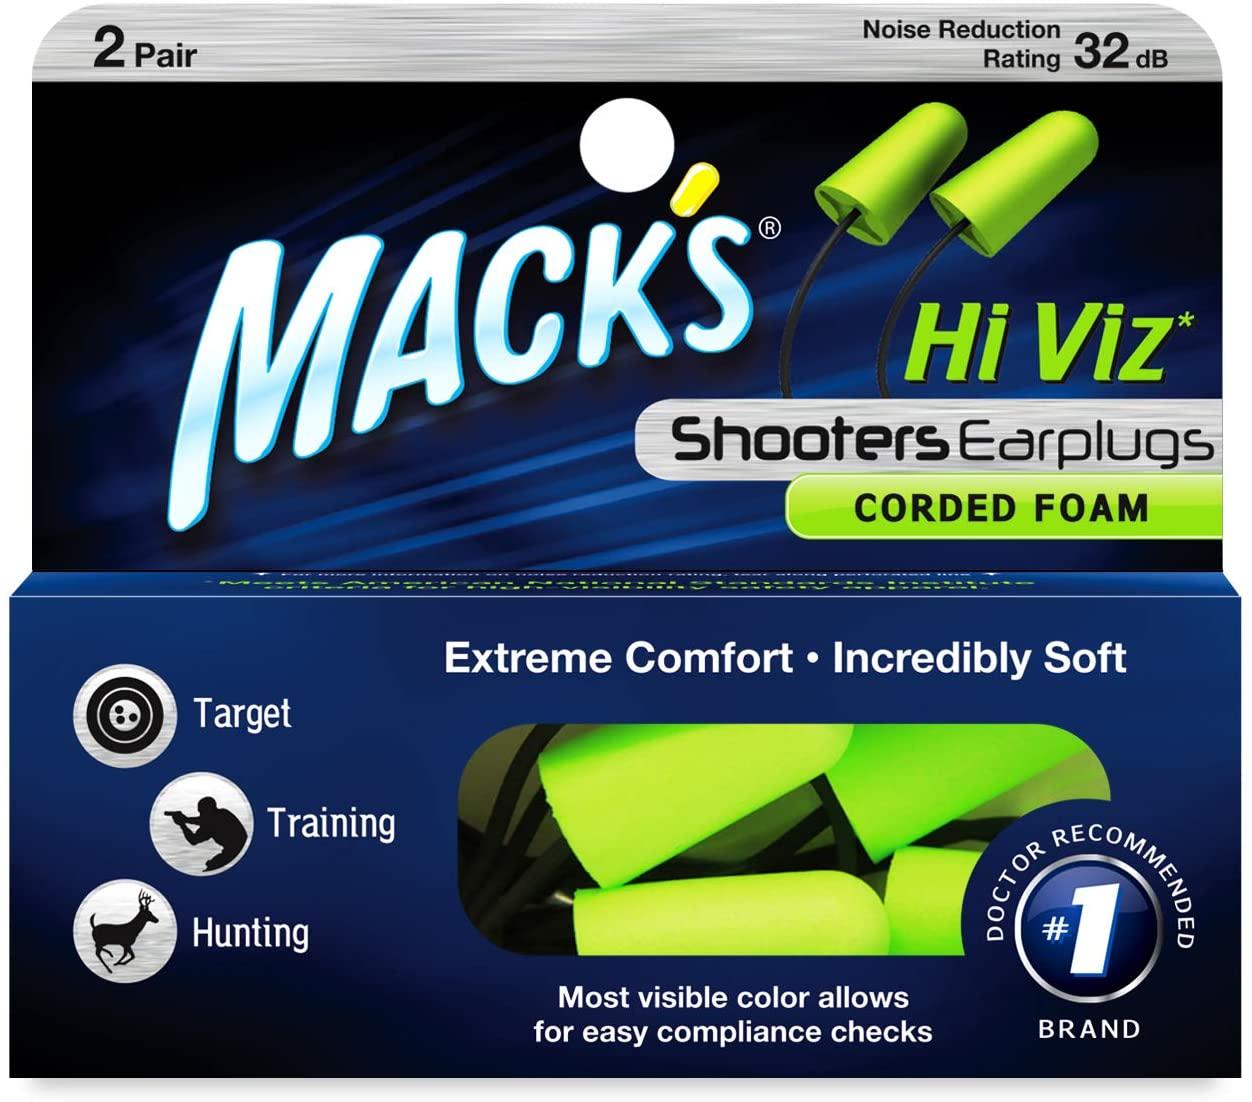 Mack's Hi Viz Corded Foam Shooting Ear Plugs, 2 Pair